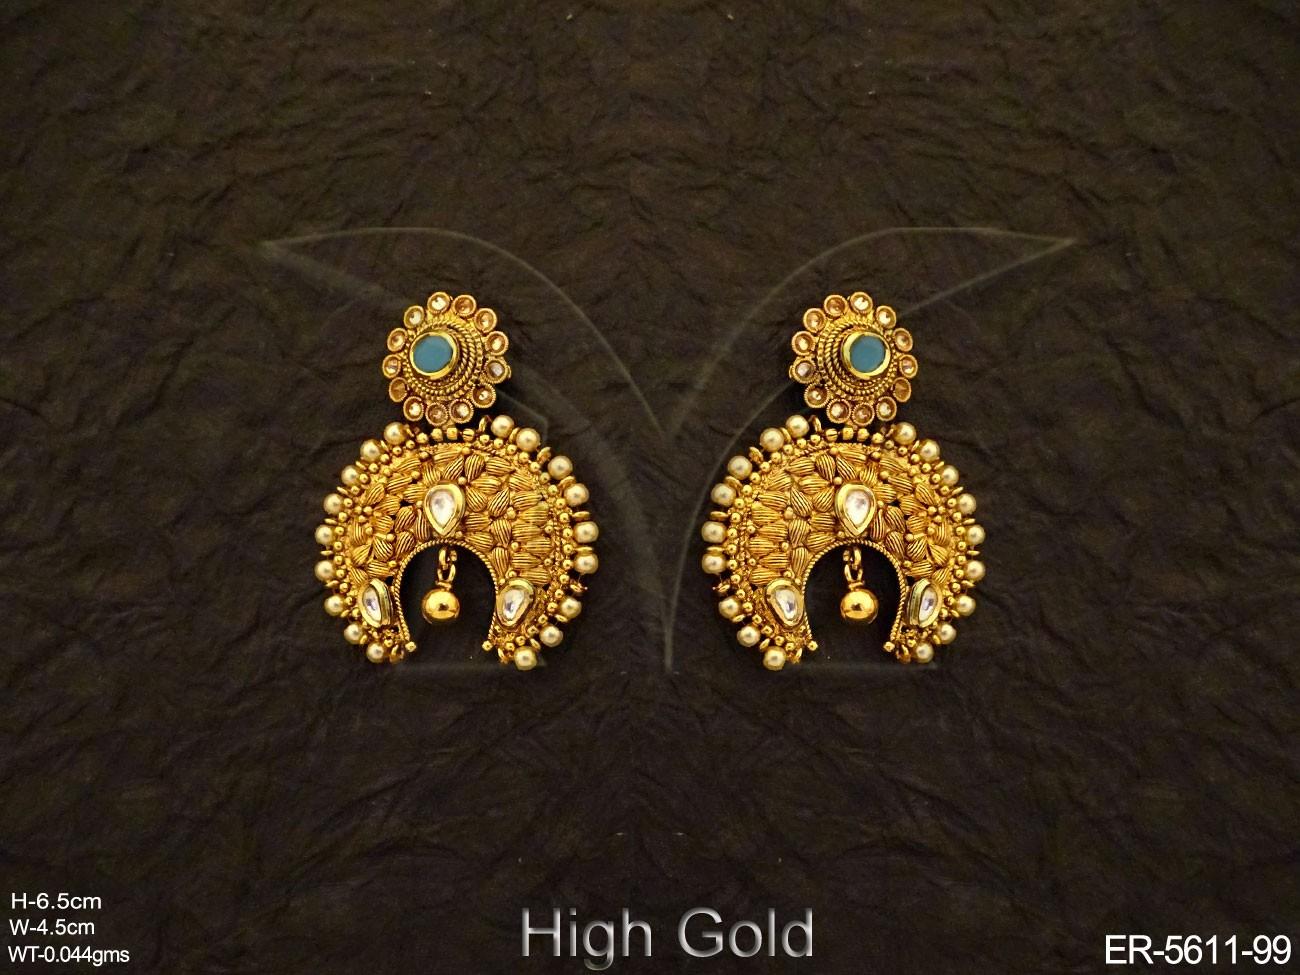 Antique Jewellery Chand bali Earring Set